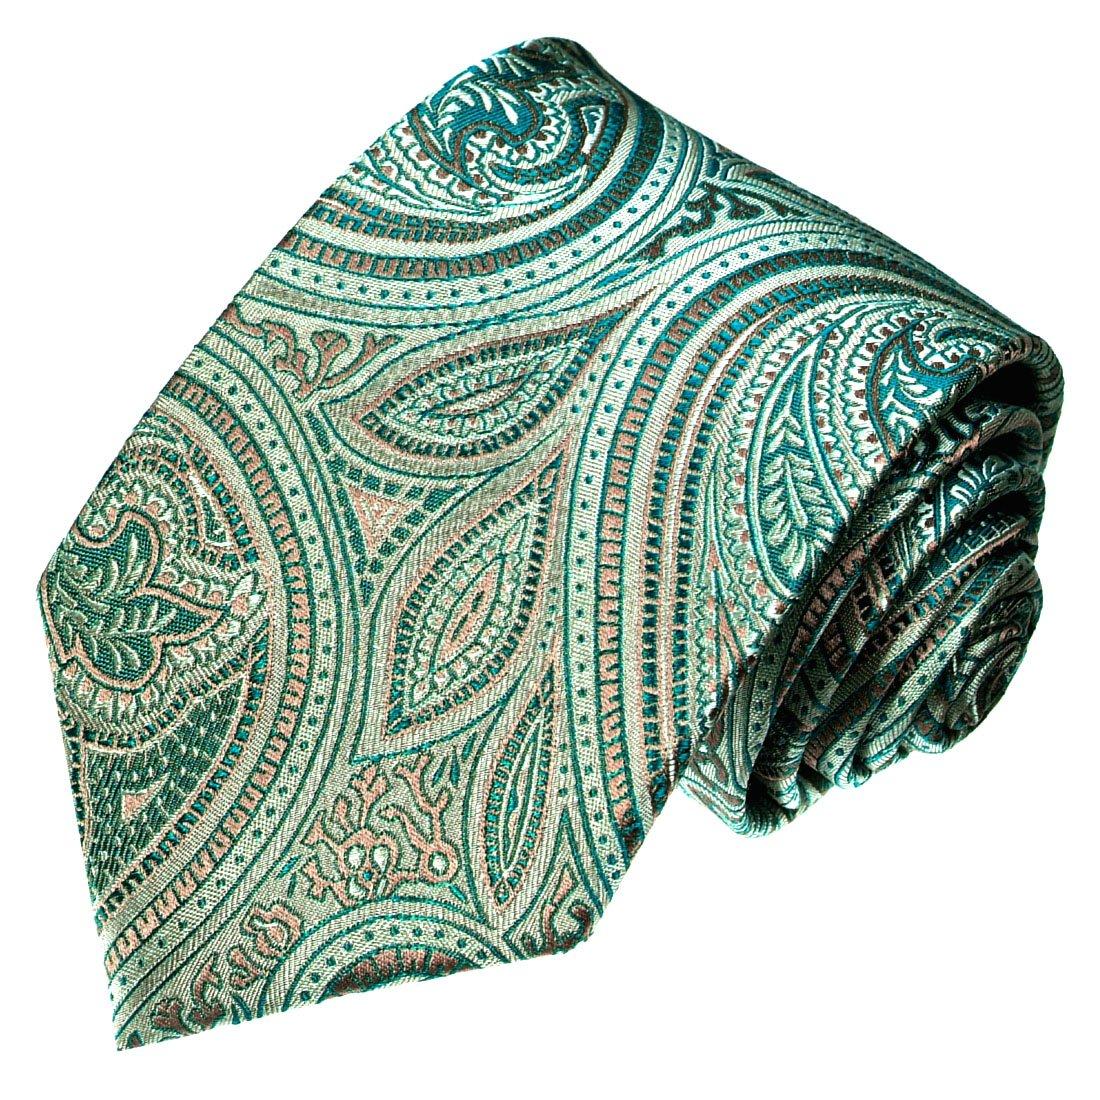 LORENZO CANA Italian 100/% Silk Tie Turquoise Lightgreen Green Paisley Silver 36090